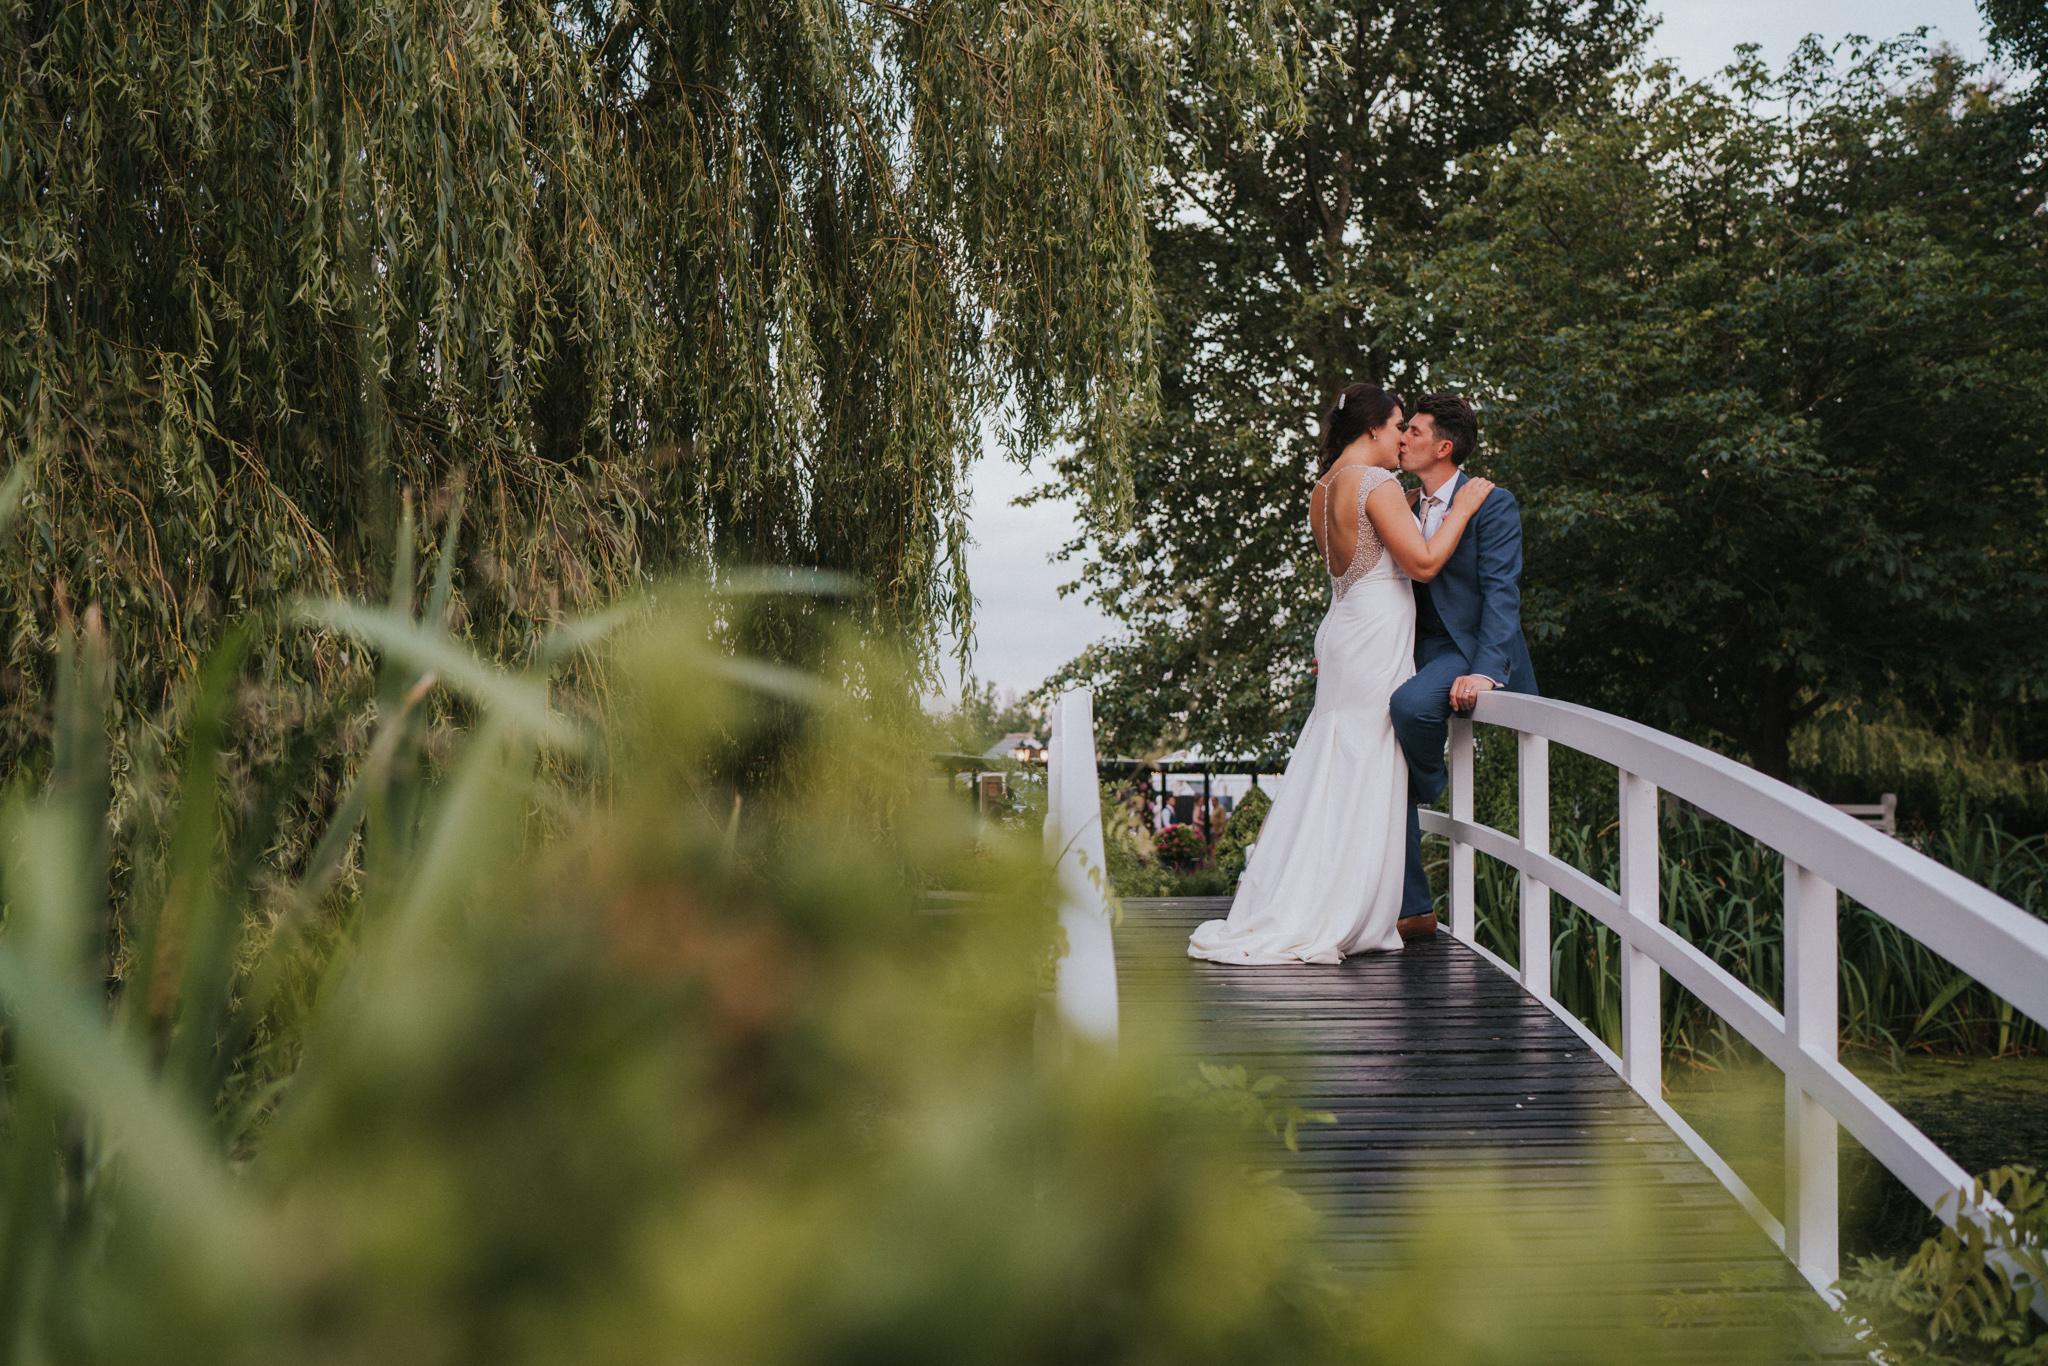 danielle-and-gareths-boho-wedding-previews-at-high-house-weddings-grace-elizabeth-colchester-essex-suffolk-norfolk-devon-alternative-wedding-and-lifestyle-photographer (75 of 76).jpg